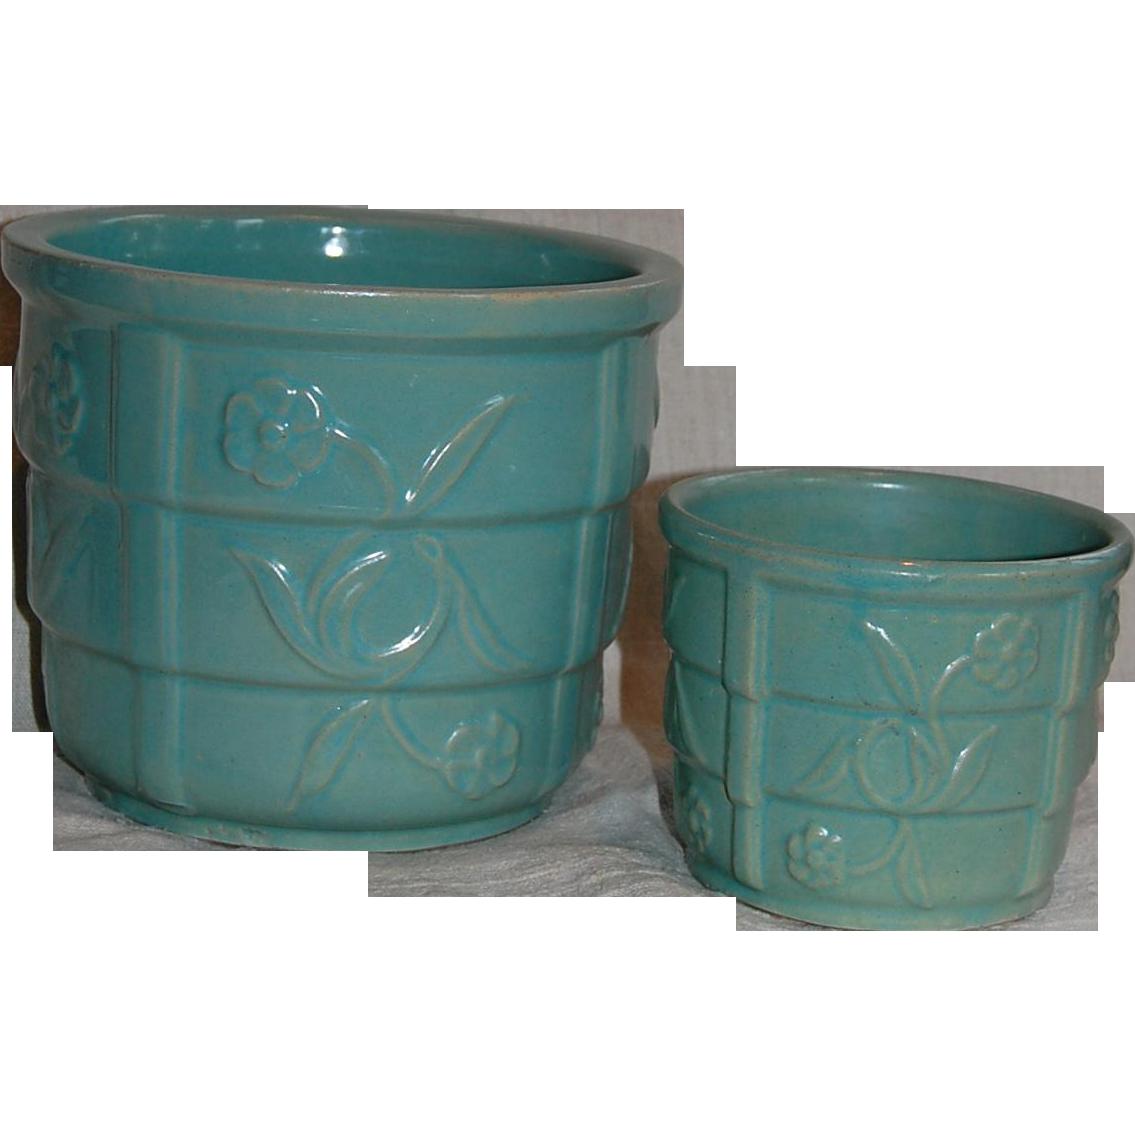 Two mid modern aqua green jardiniere flower pots from Modern plant pots